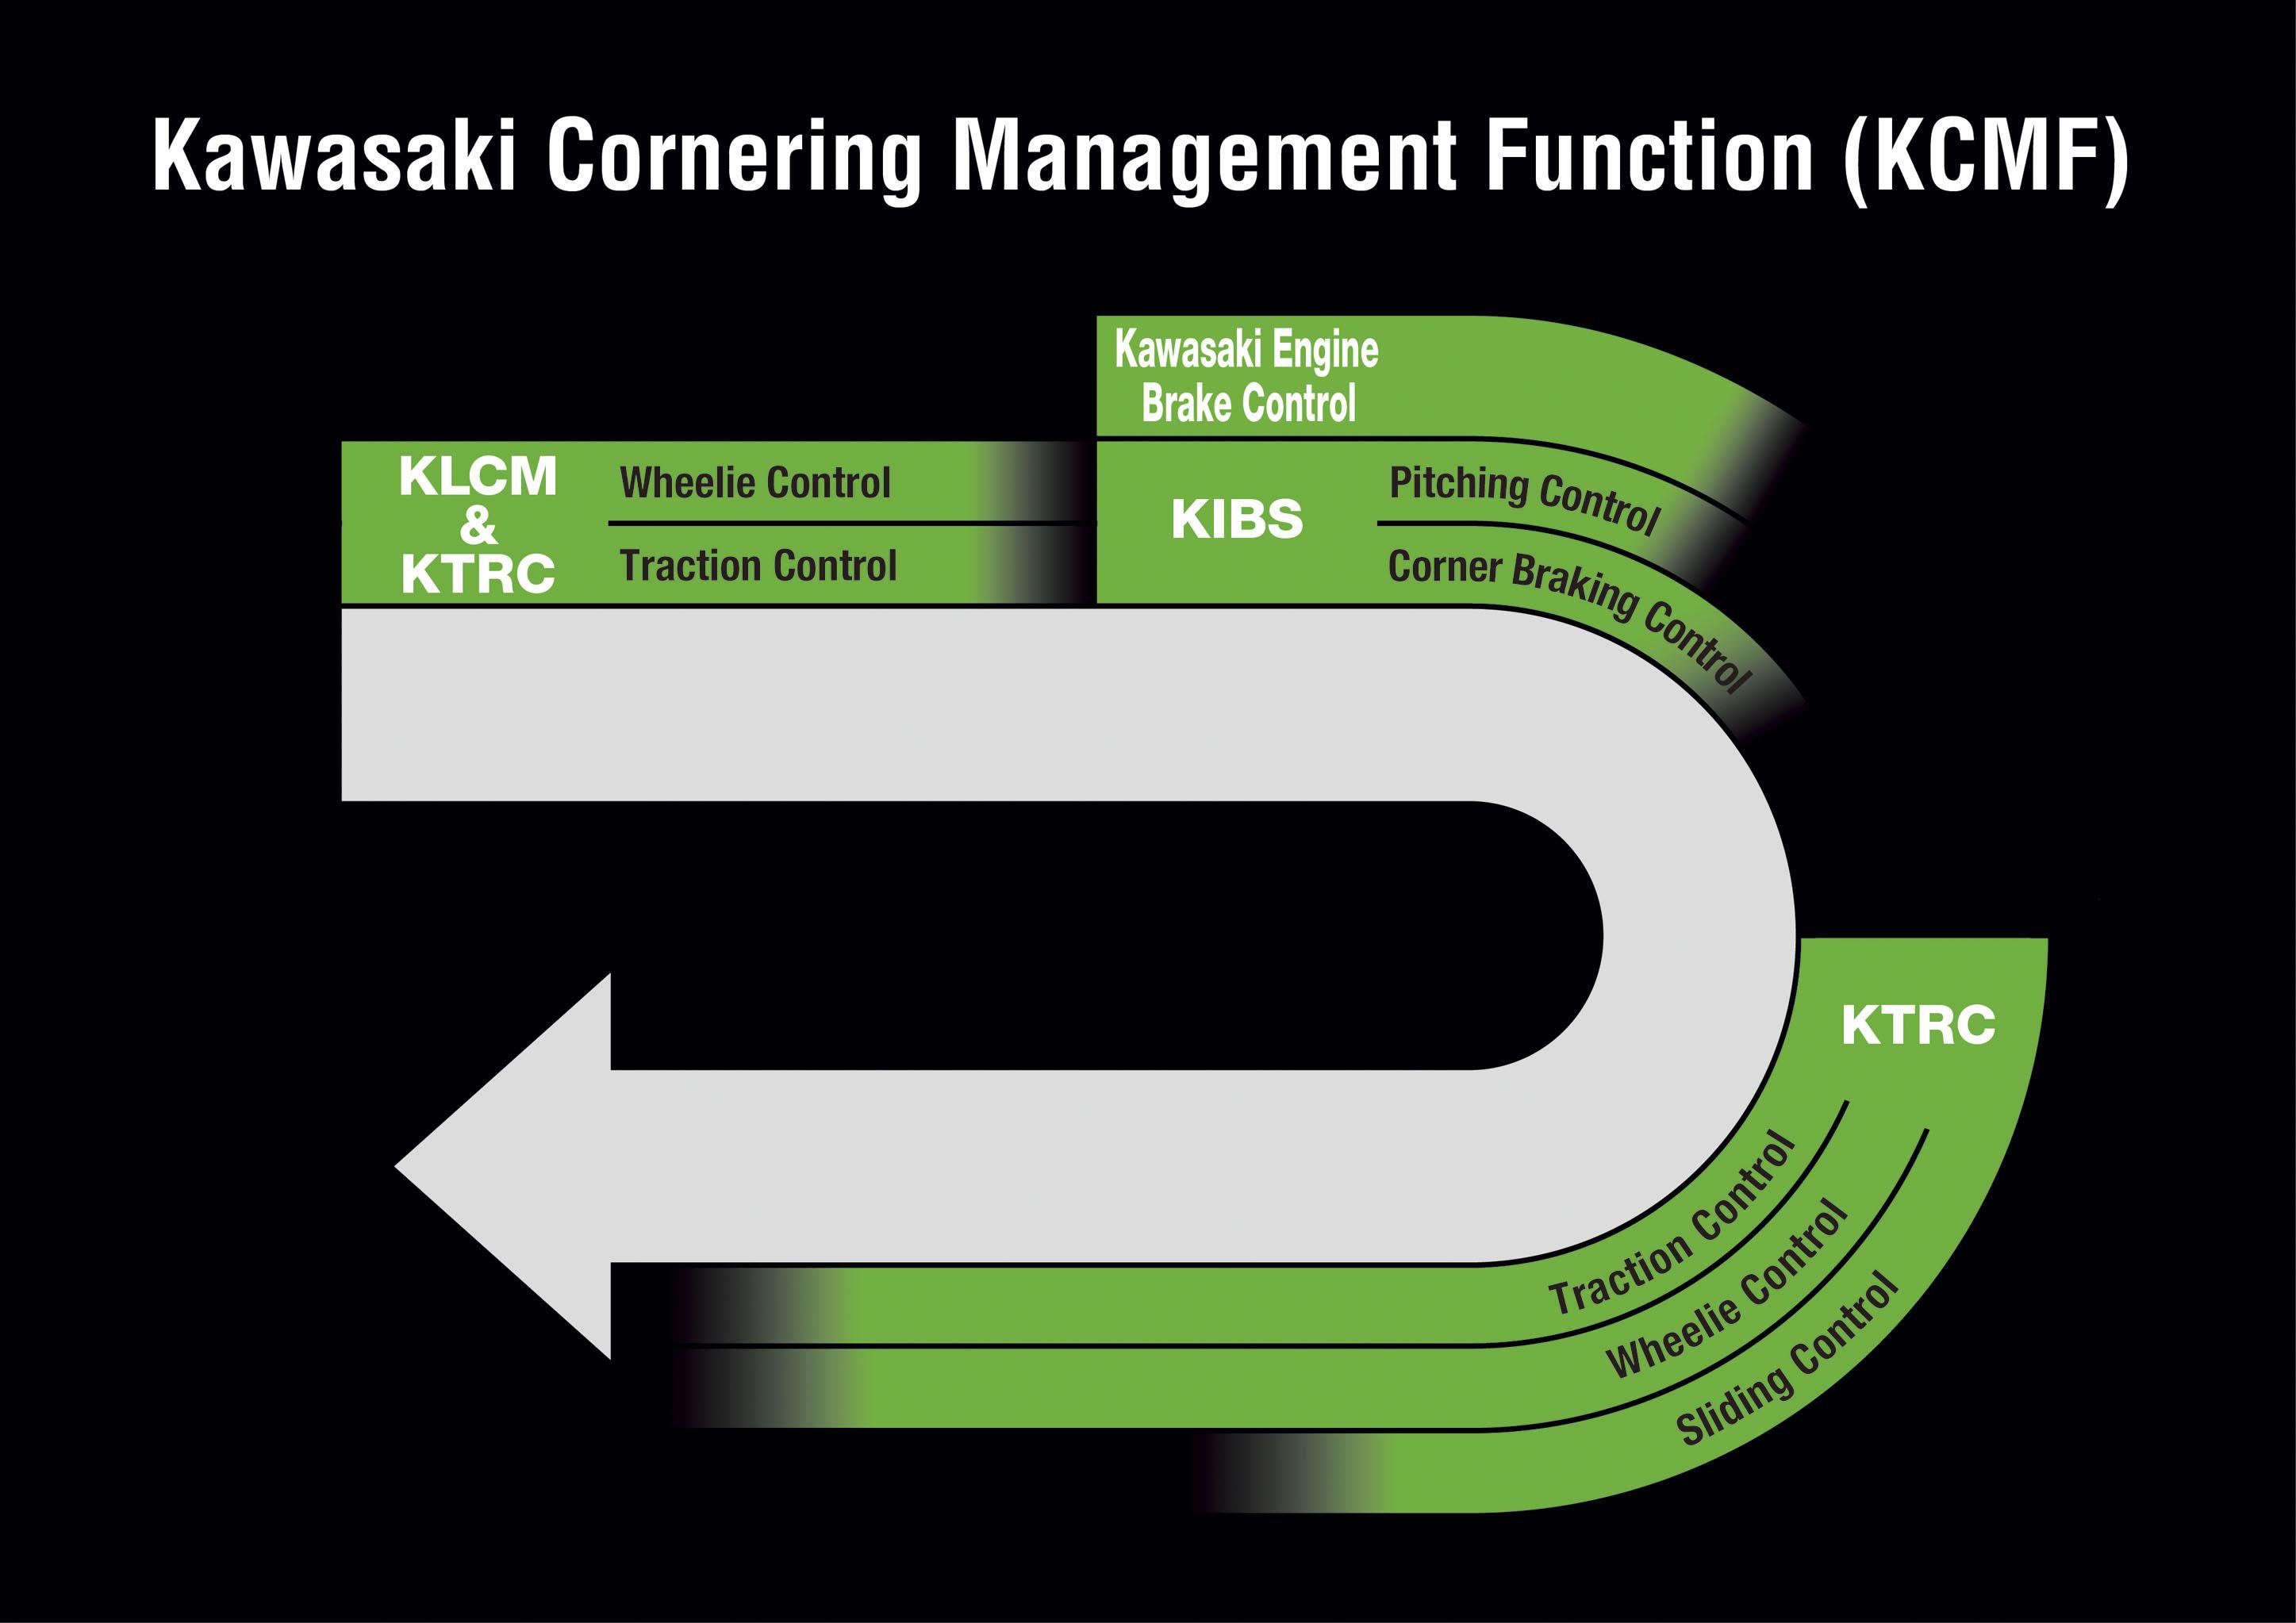 Kawasaki cornering management function control diagram